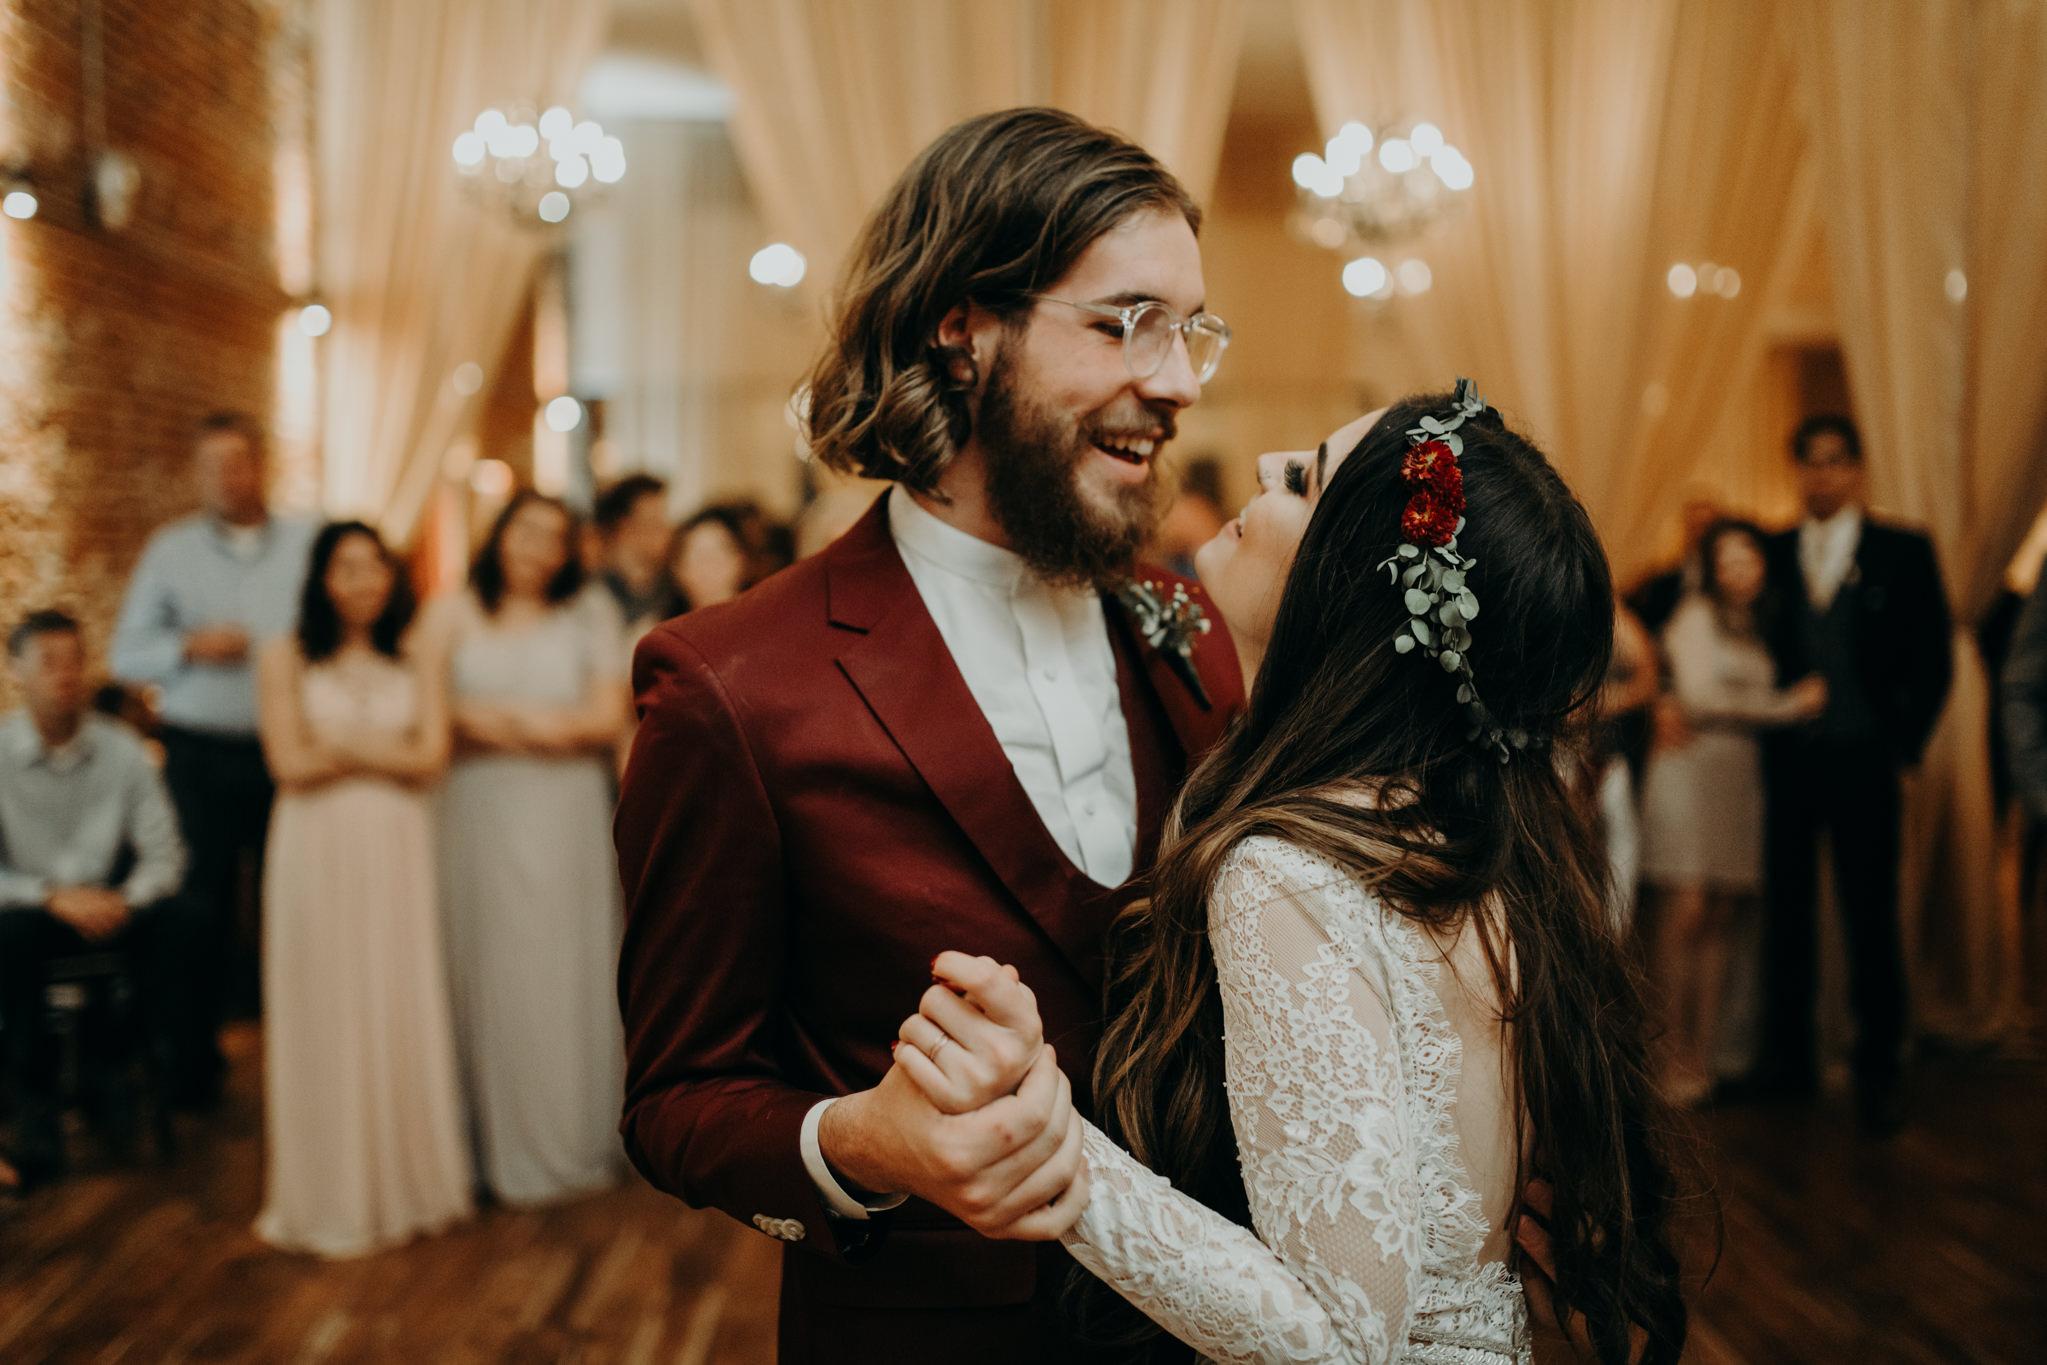 couple-wedding-indie-wedding-northern-california-131.jpg